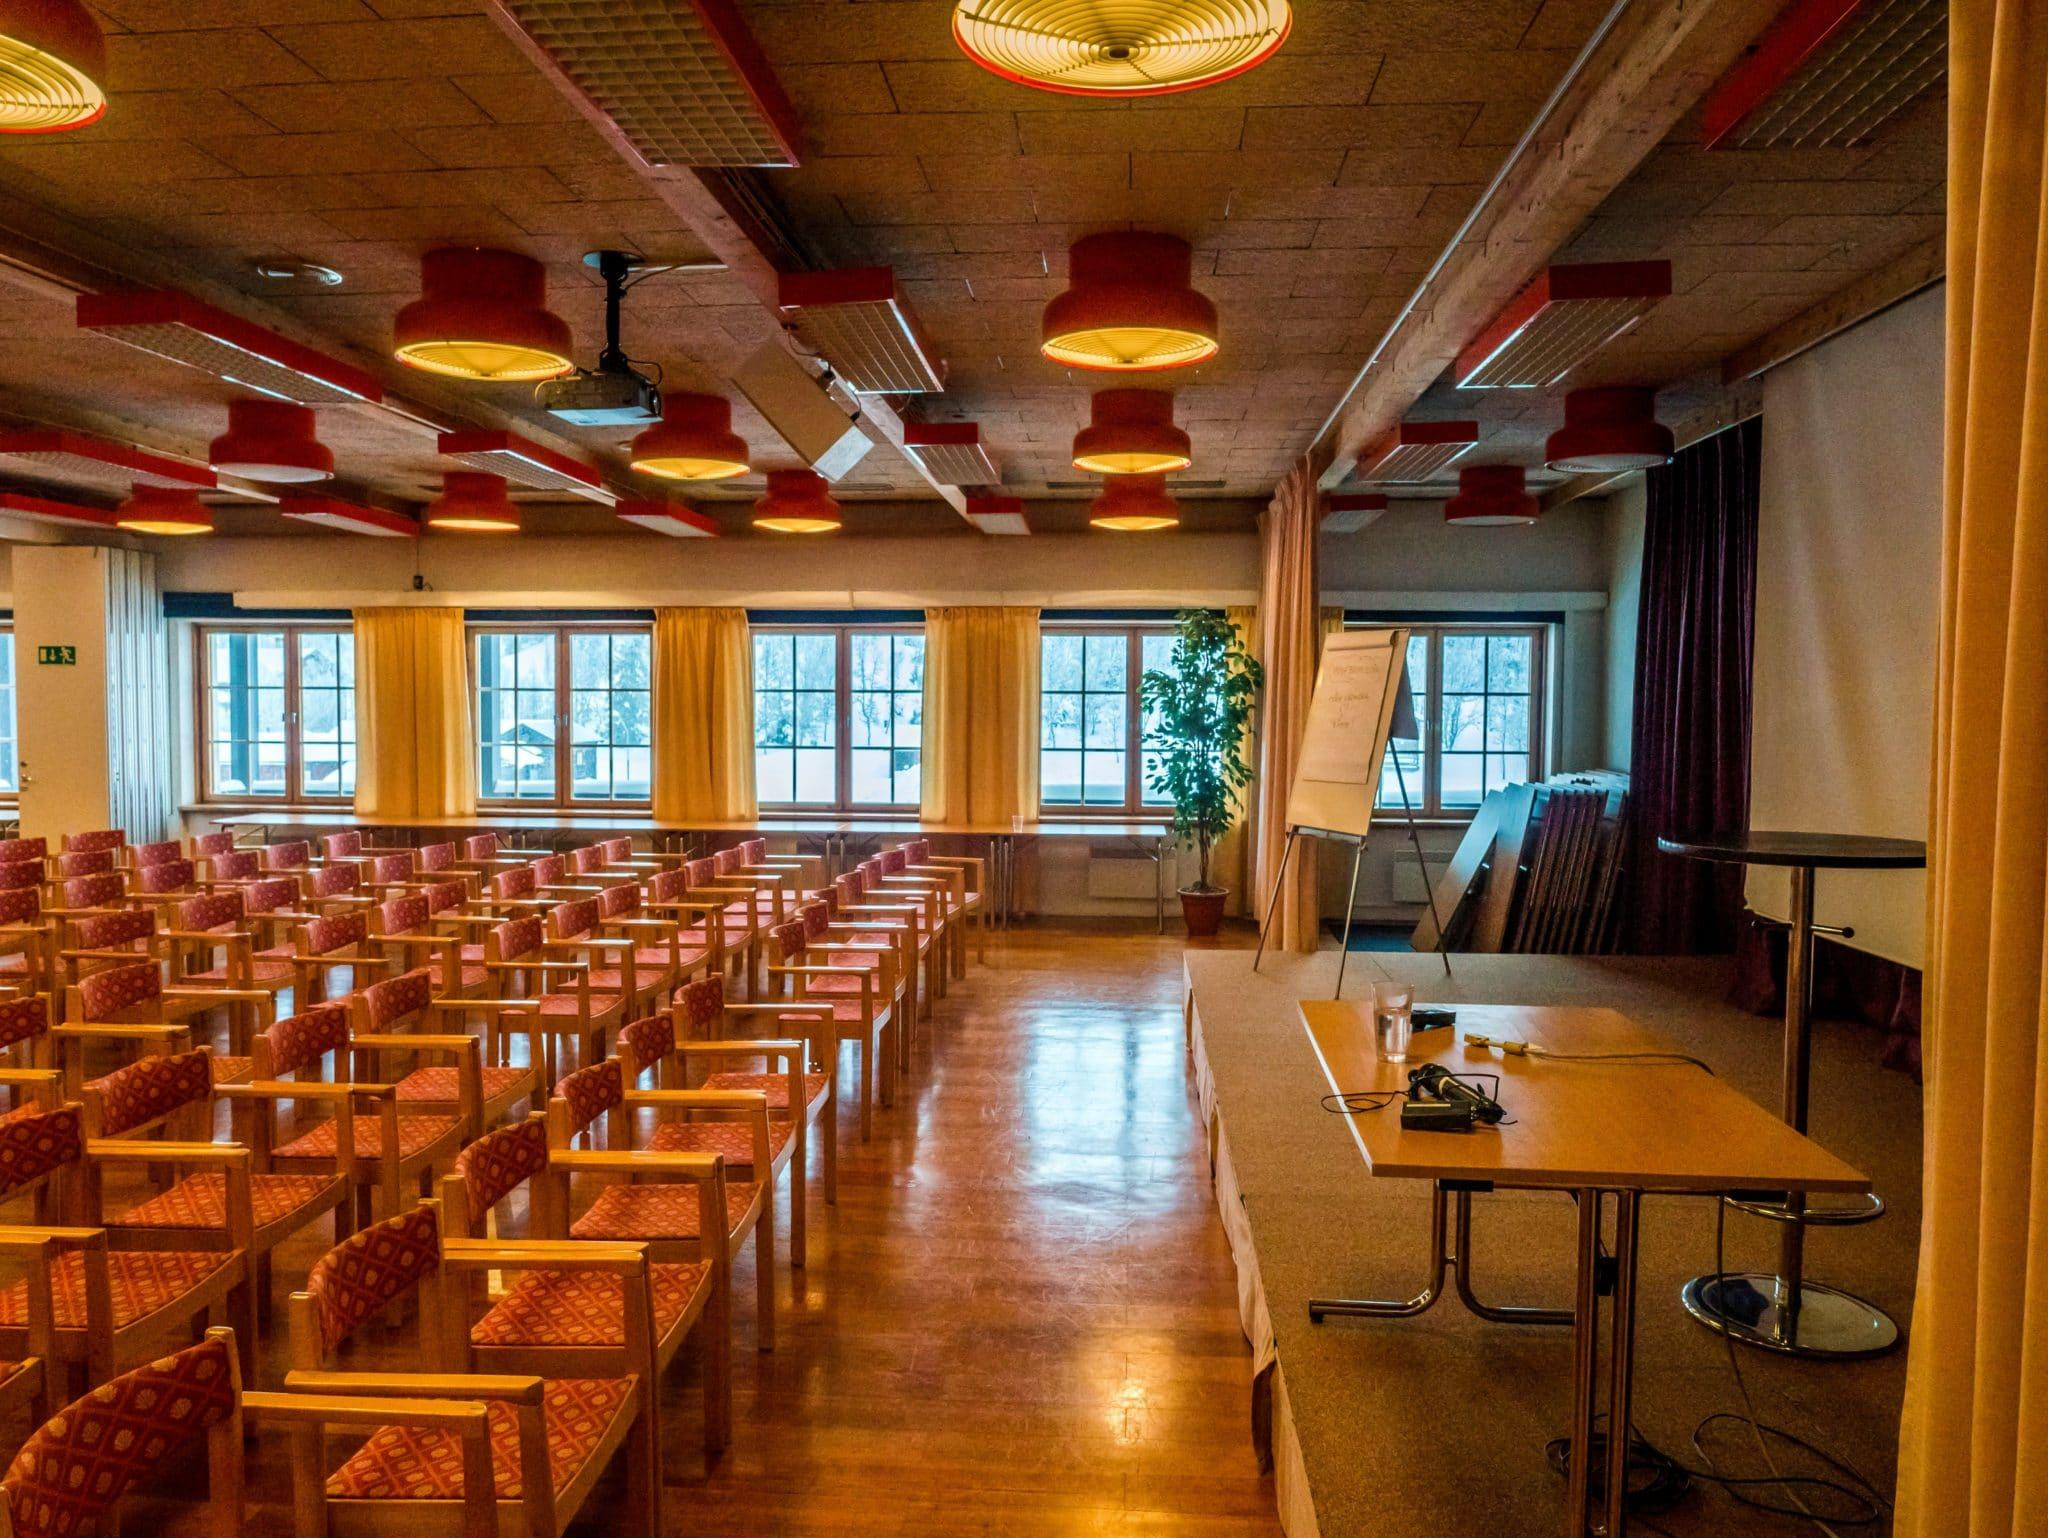 Konferens i Vemdalen. Hovdesalen 1, 125 personer